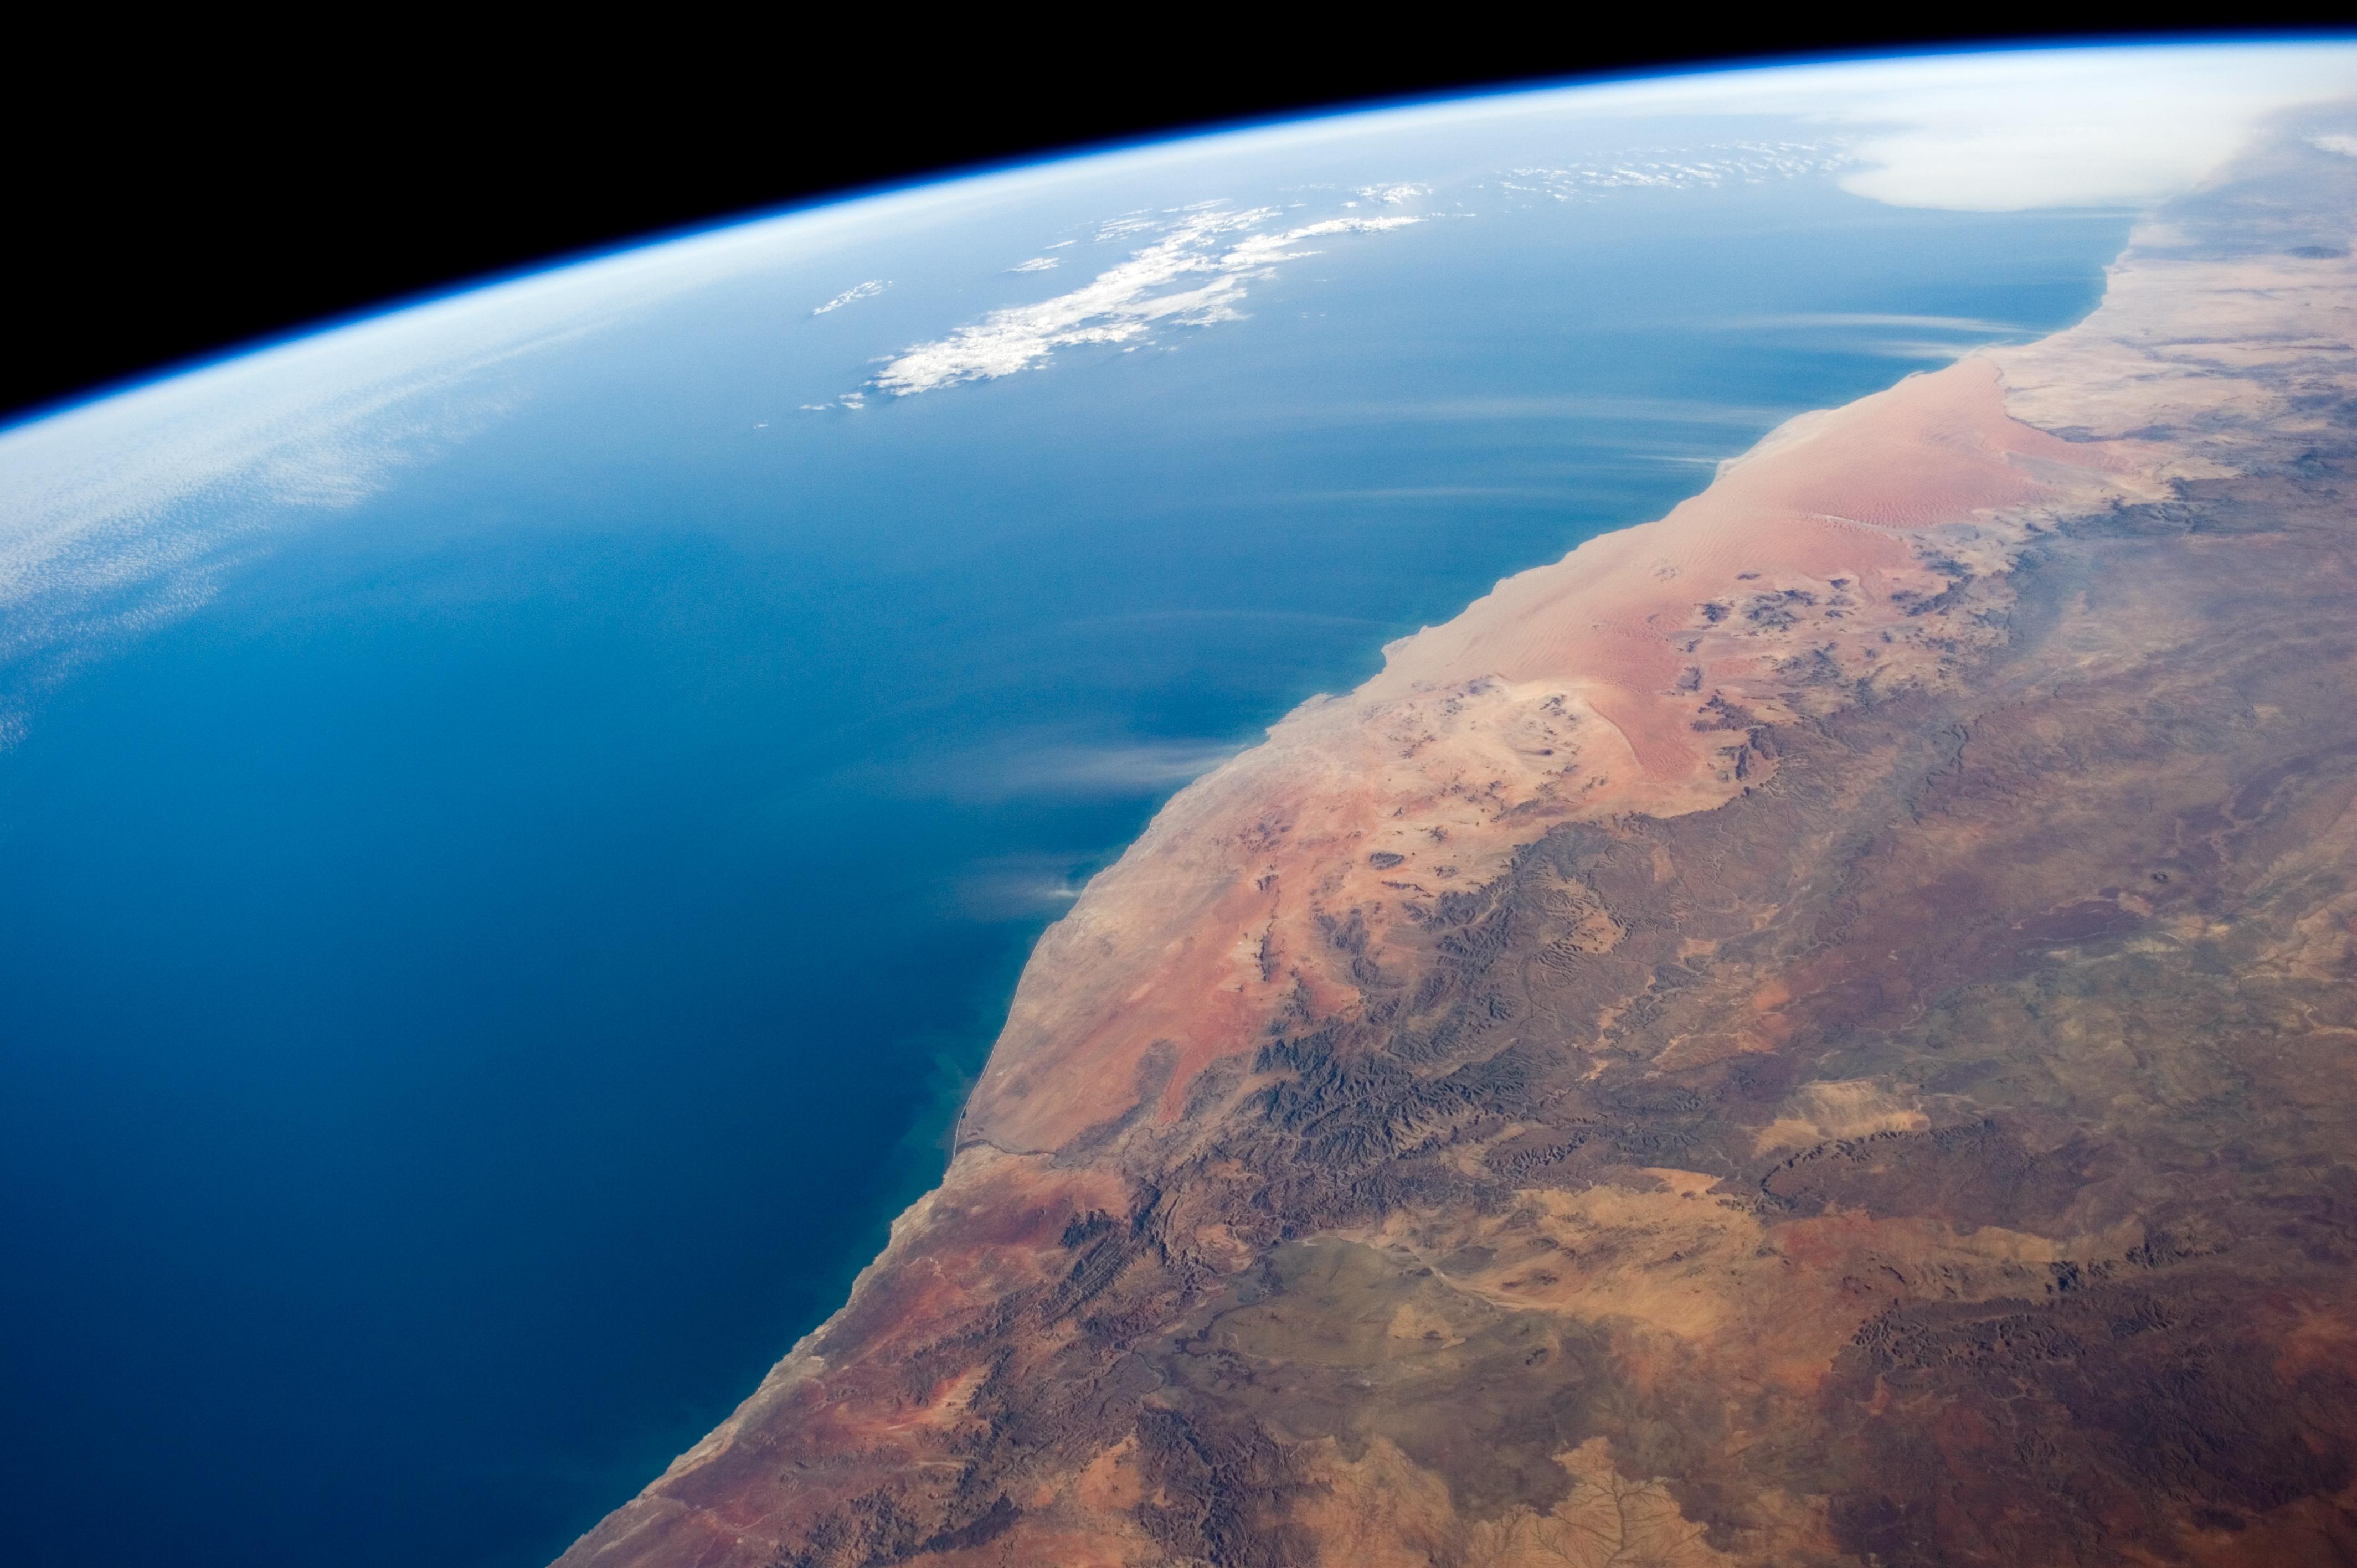 фото атлантического океана с космоса